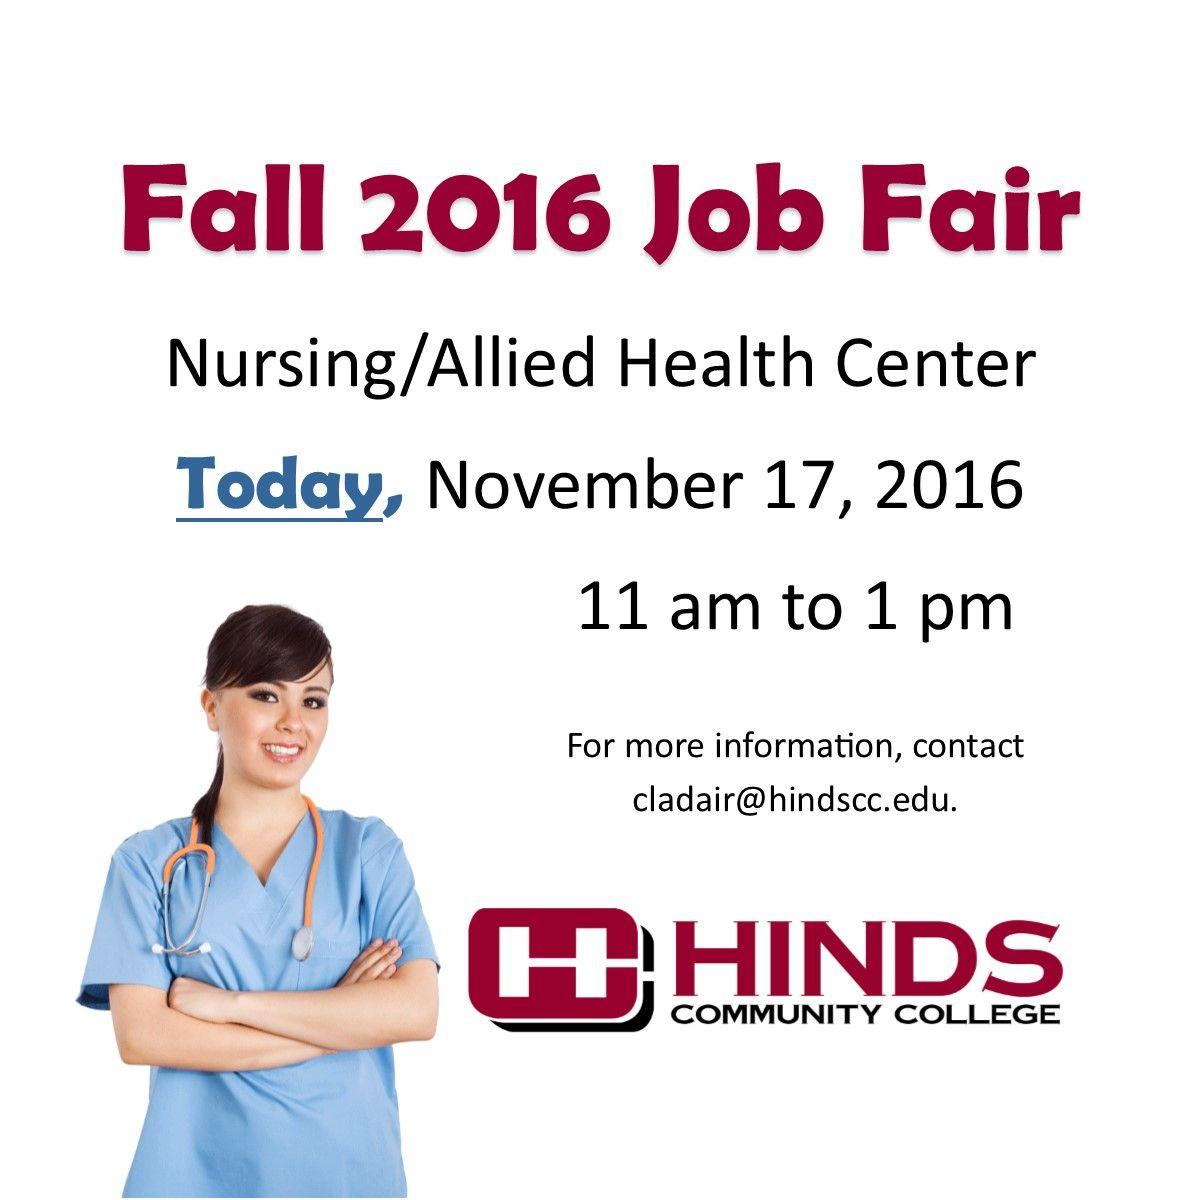 Fall Job Fair 2016 Job fair, Health center, Community